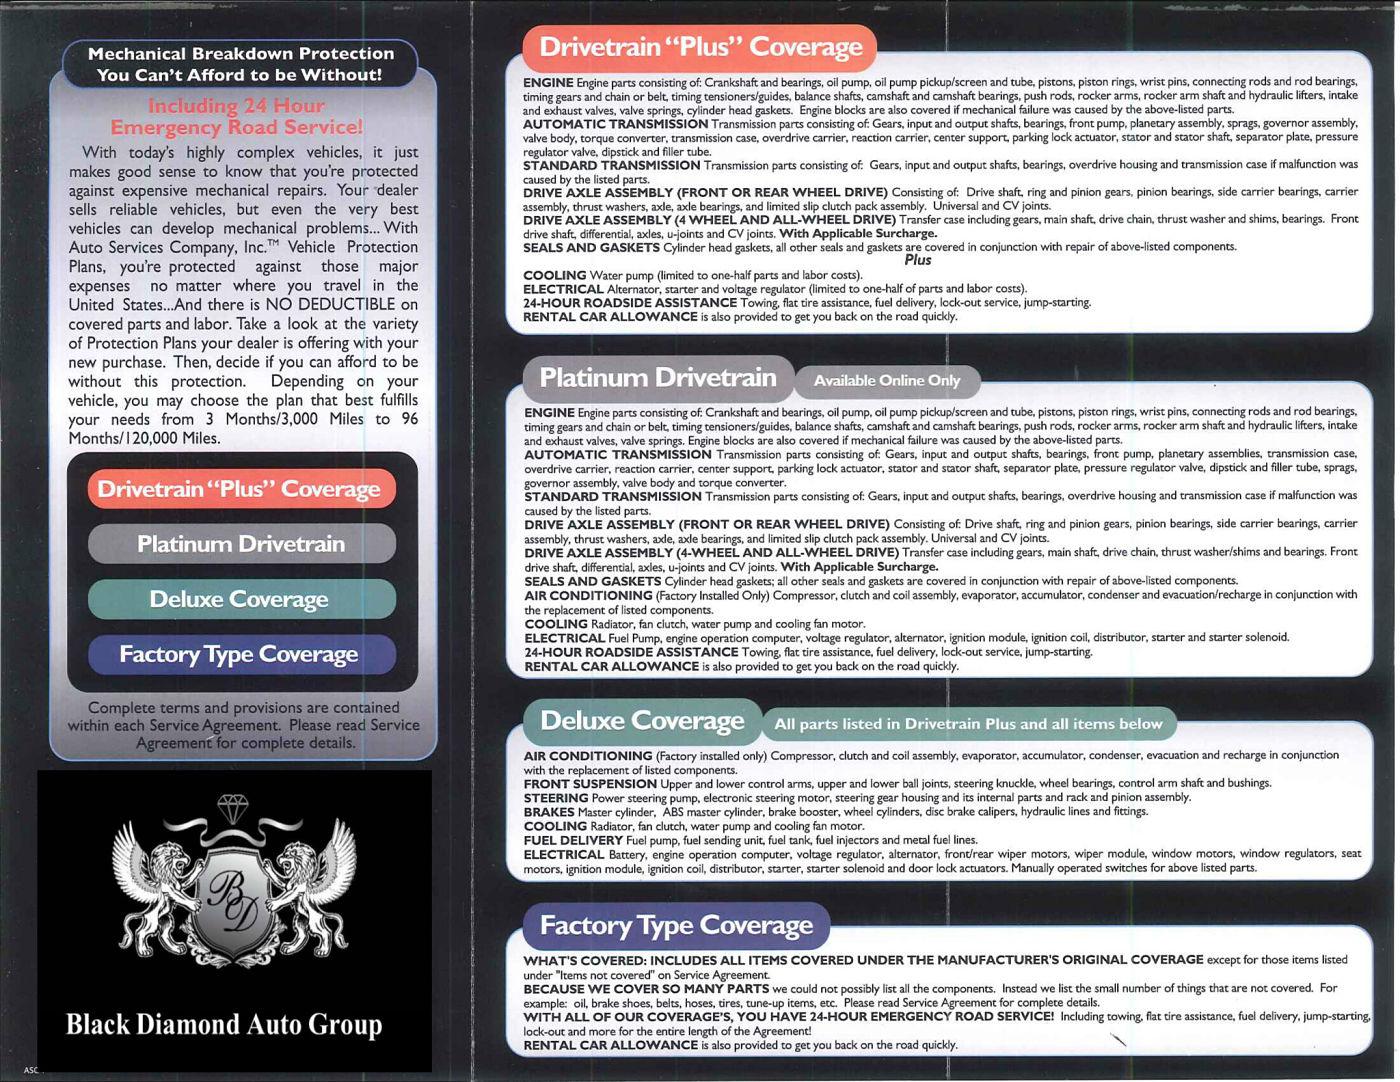 black diamond auto group finance auto dealership in las vegas auto dealership in las vegas